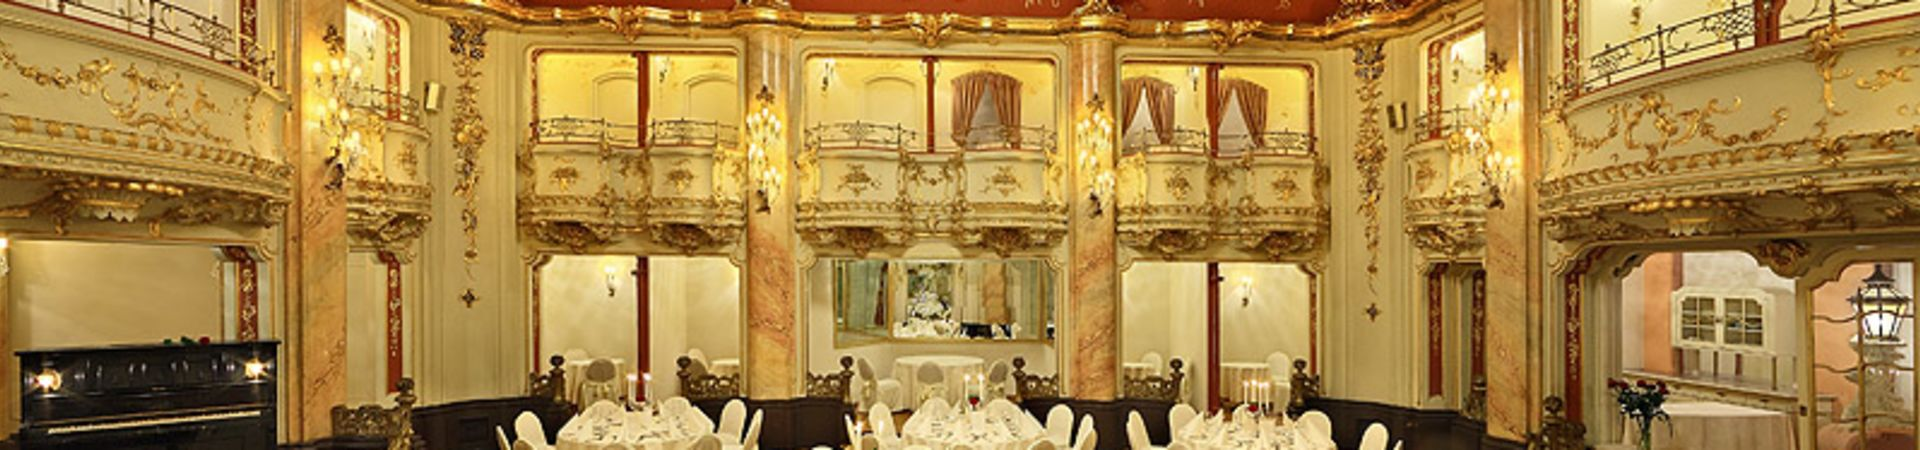 Grand Hotel Bohemia Prague - Sál Boccaccio